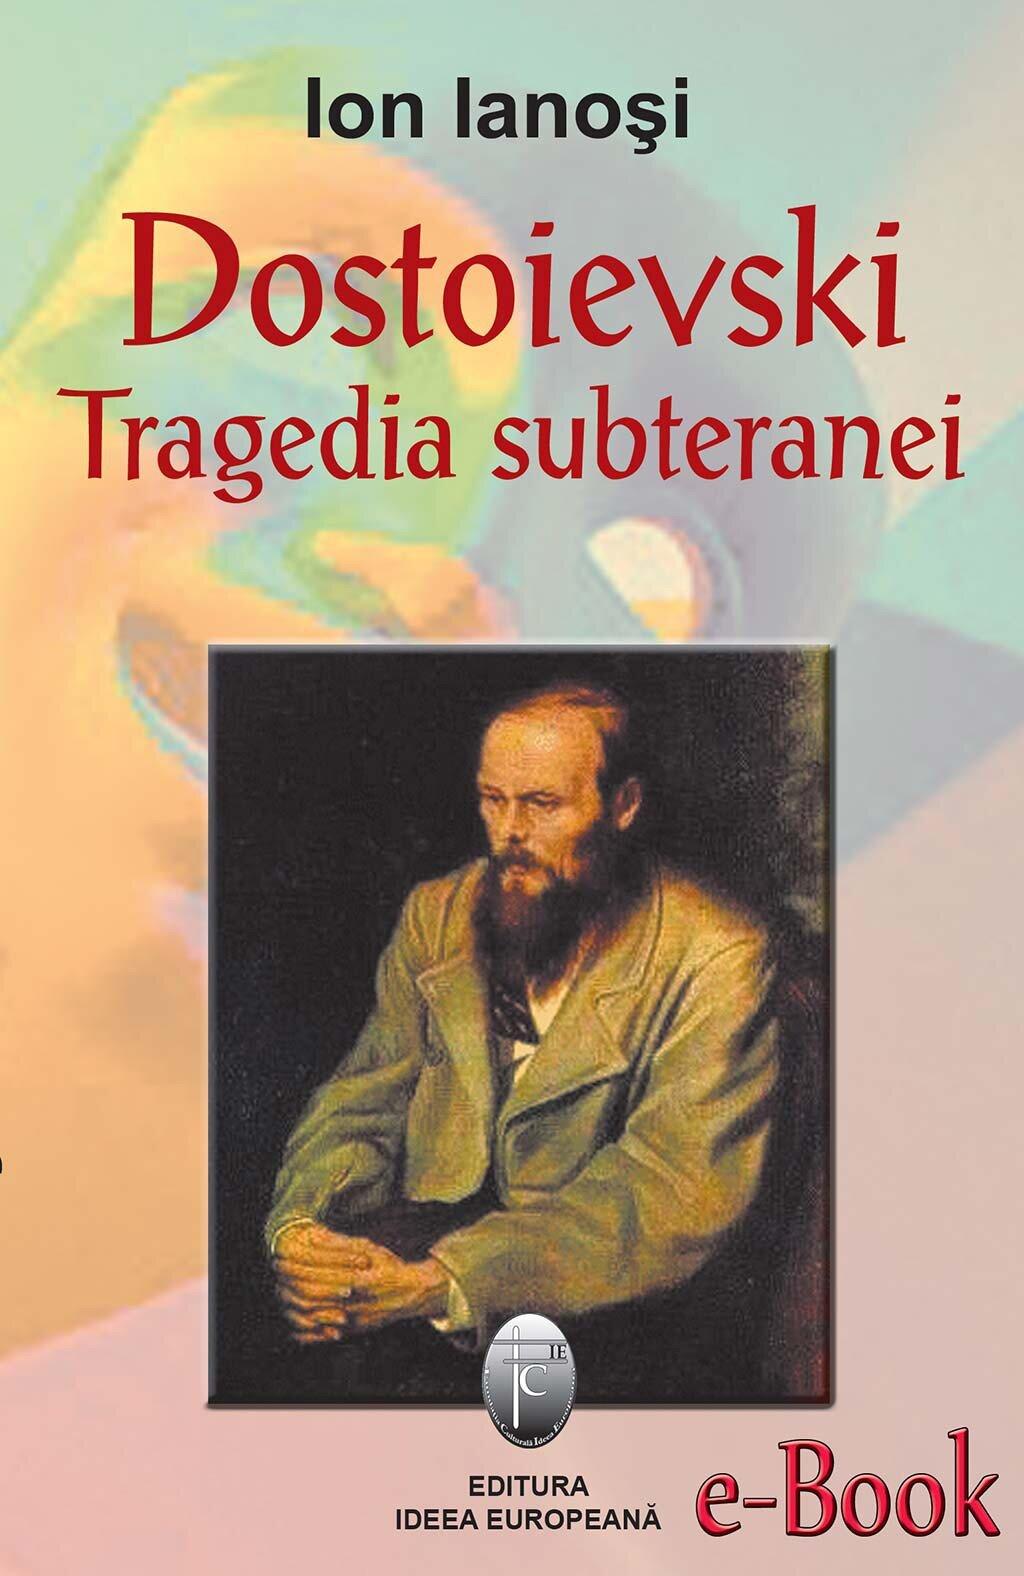 Dostoievski, tragedia subteranei (eBook)